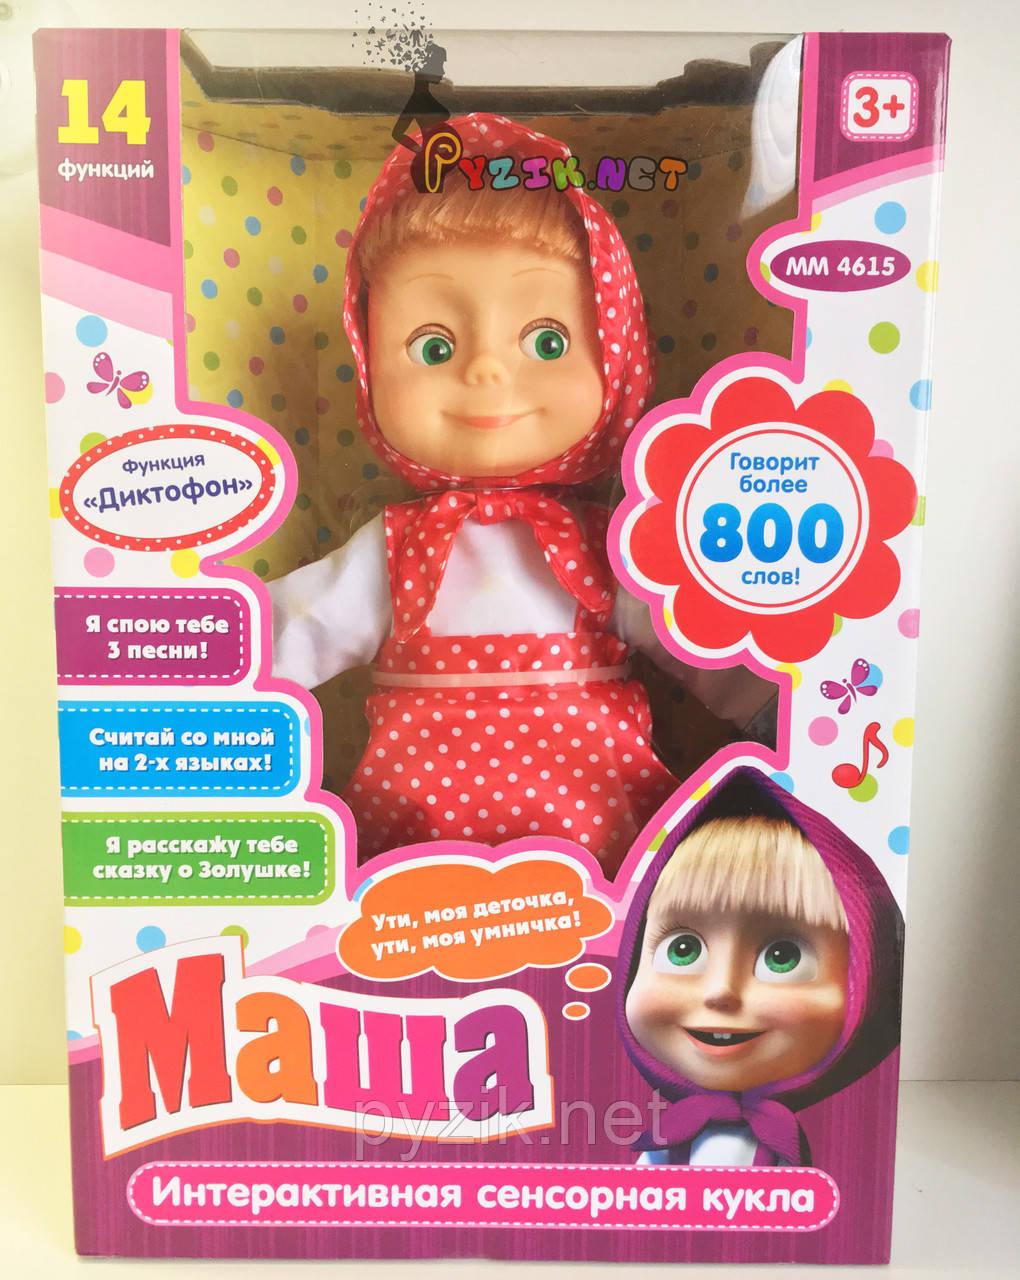 Интерактивная кукла Маша сказочница 800 фраз